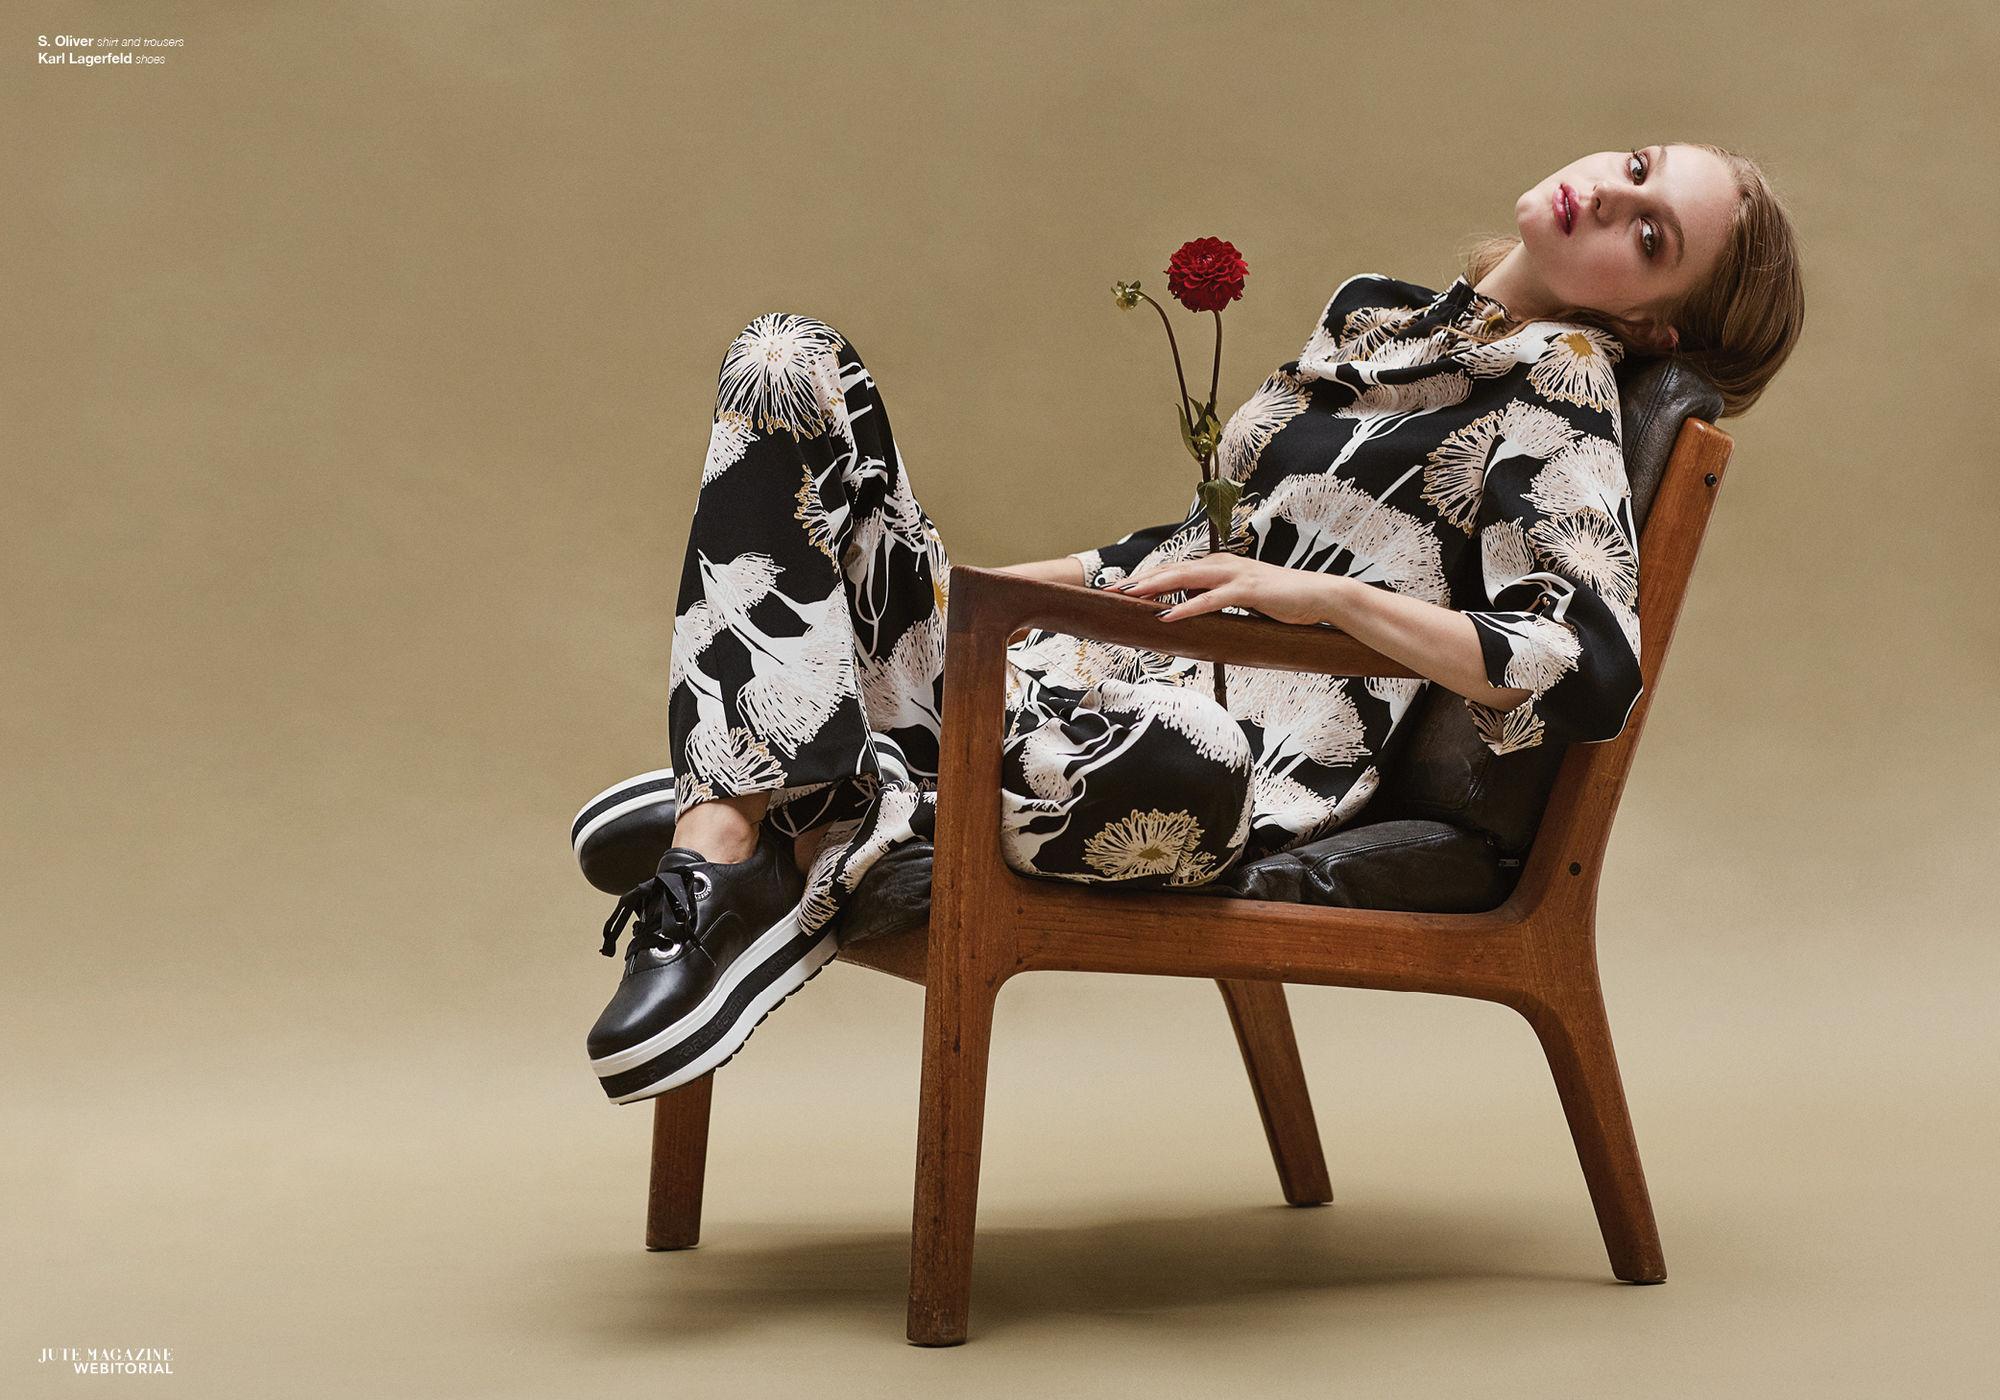 Anna Clara for Jute Magazine shot by Verena Voetter